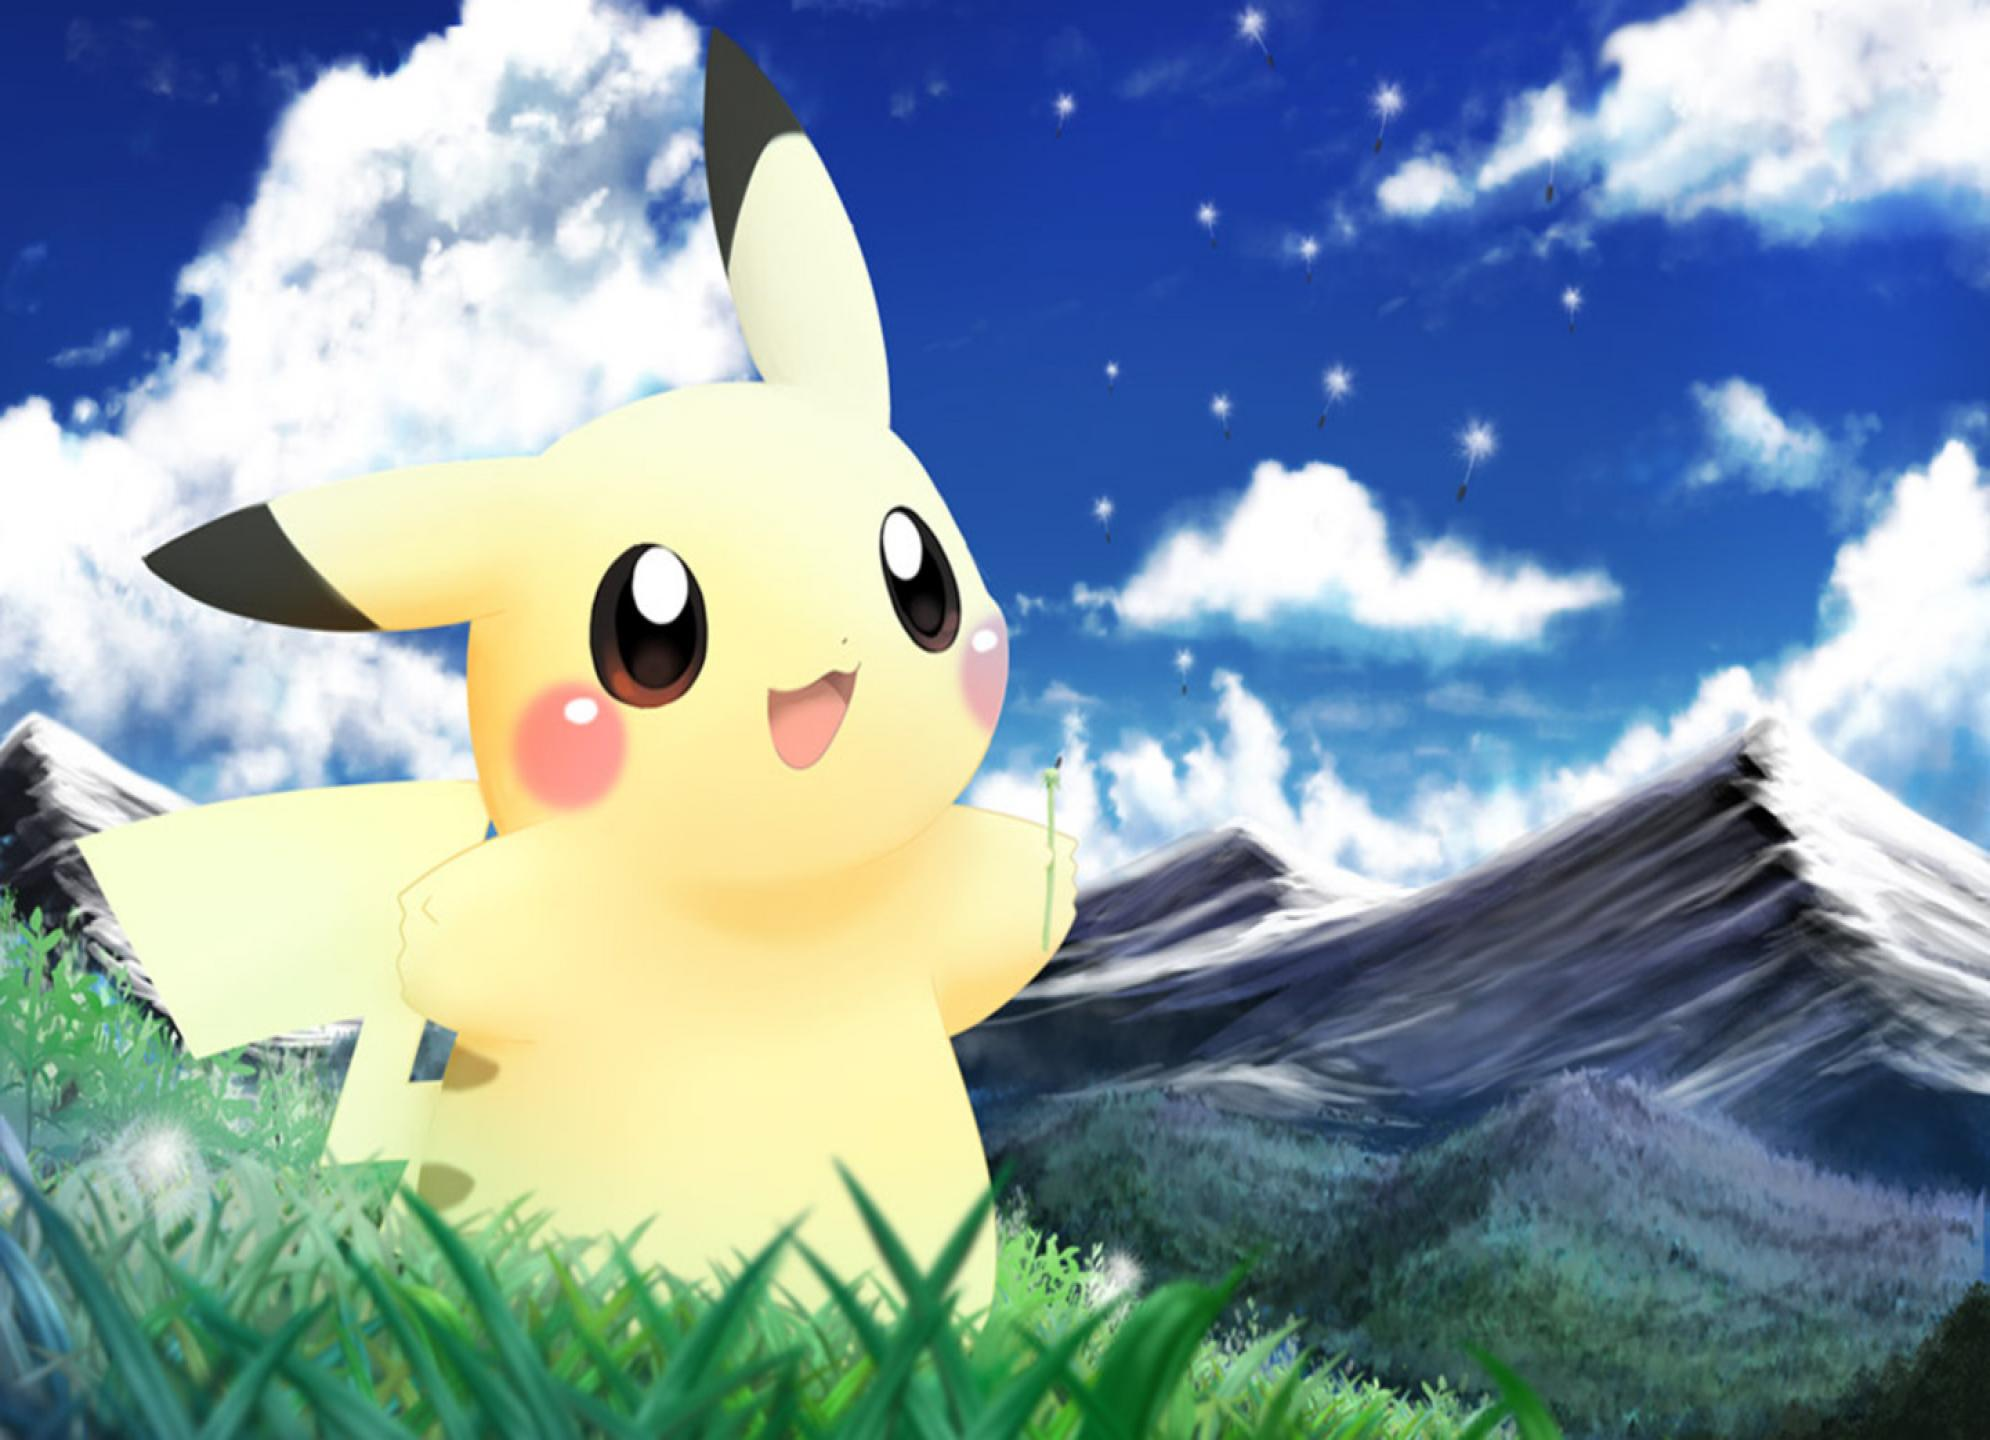 anime pokemon wallpapers hd - photo #10